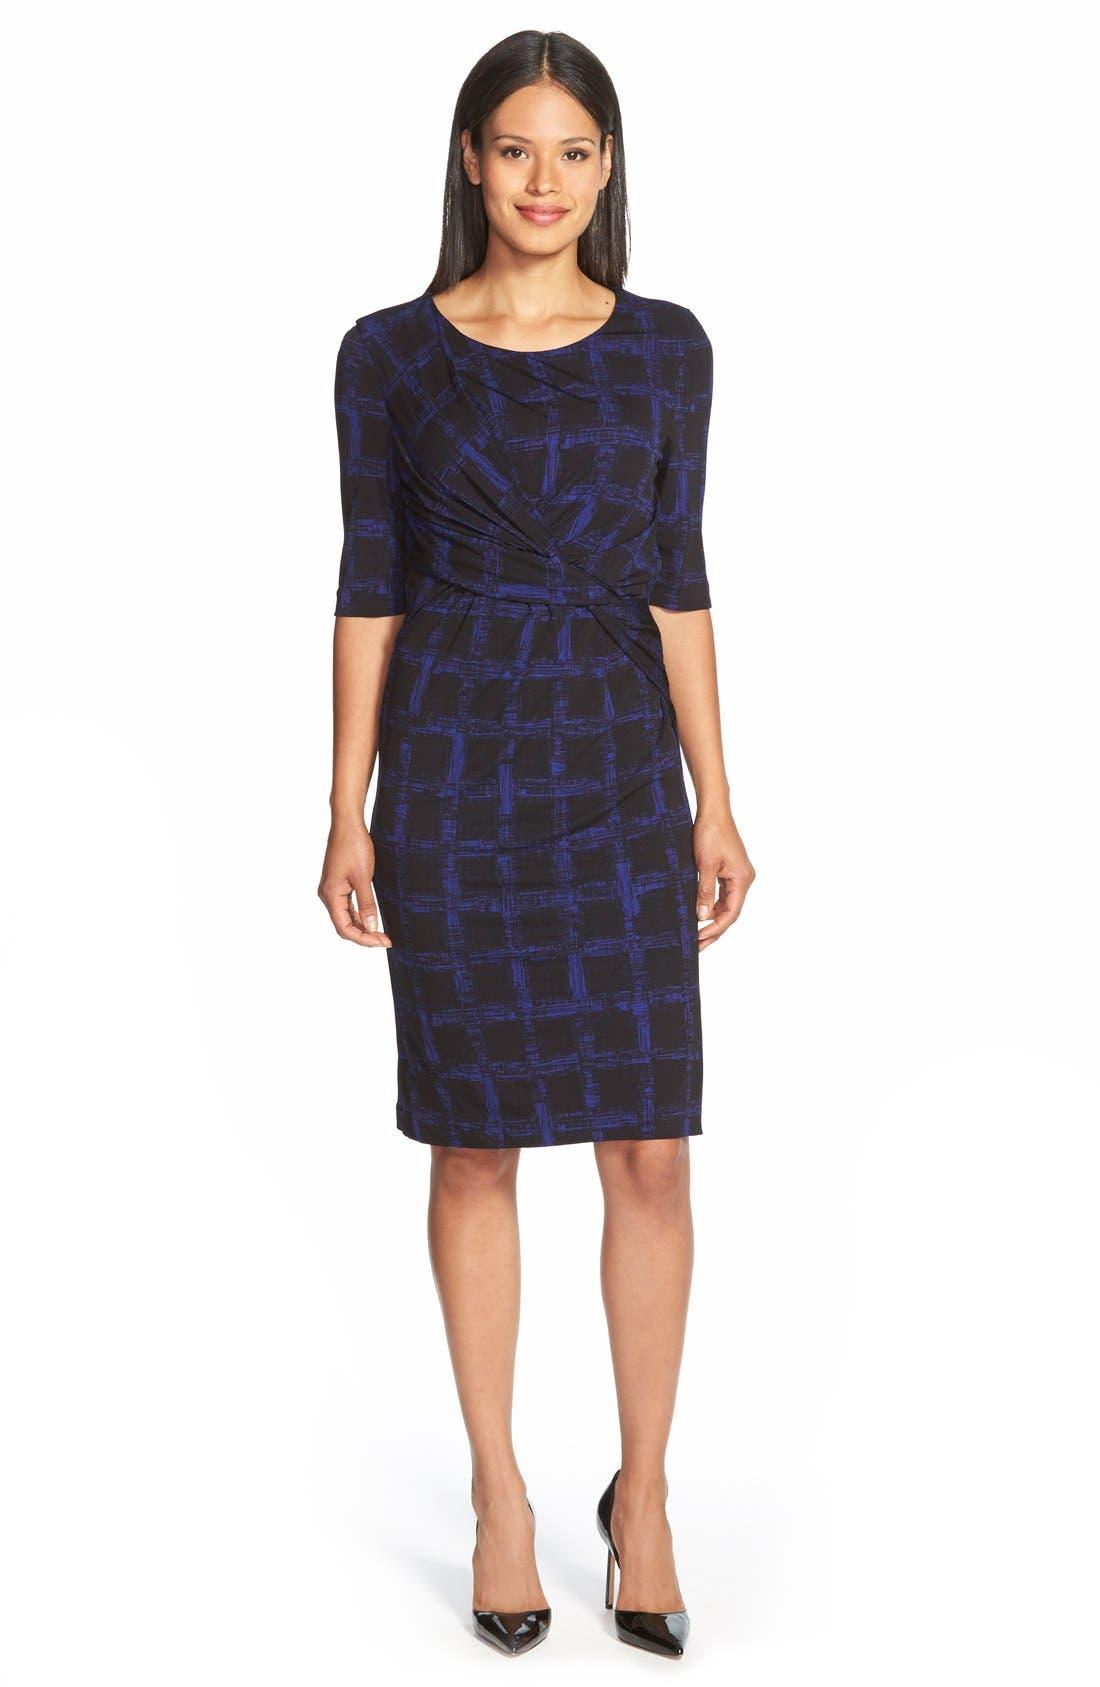 Alternate Image 1 Selected - BOSS 'Empiria' Windowpane Print Jersey Sheath Dress